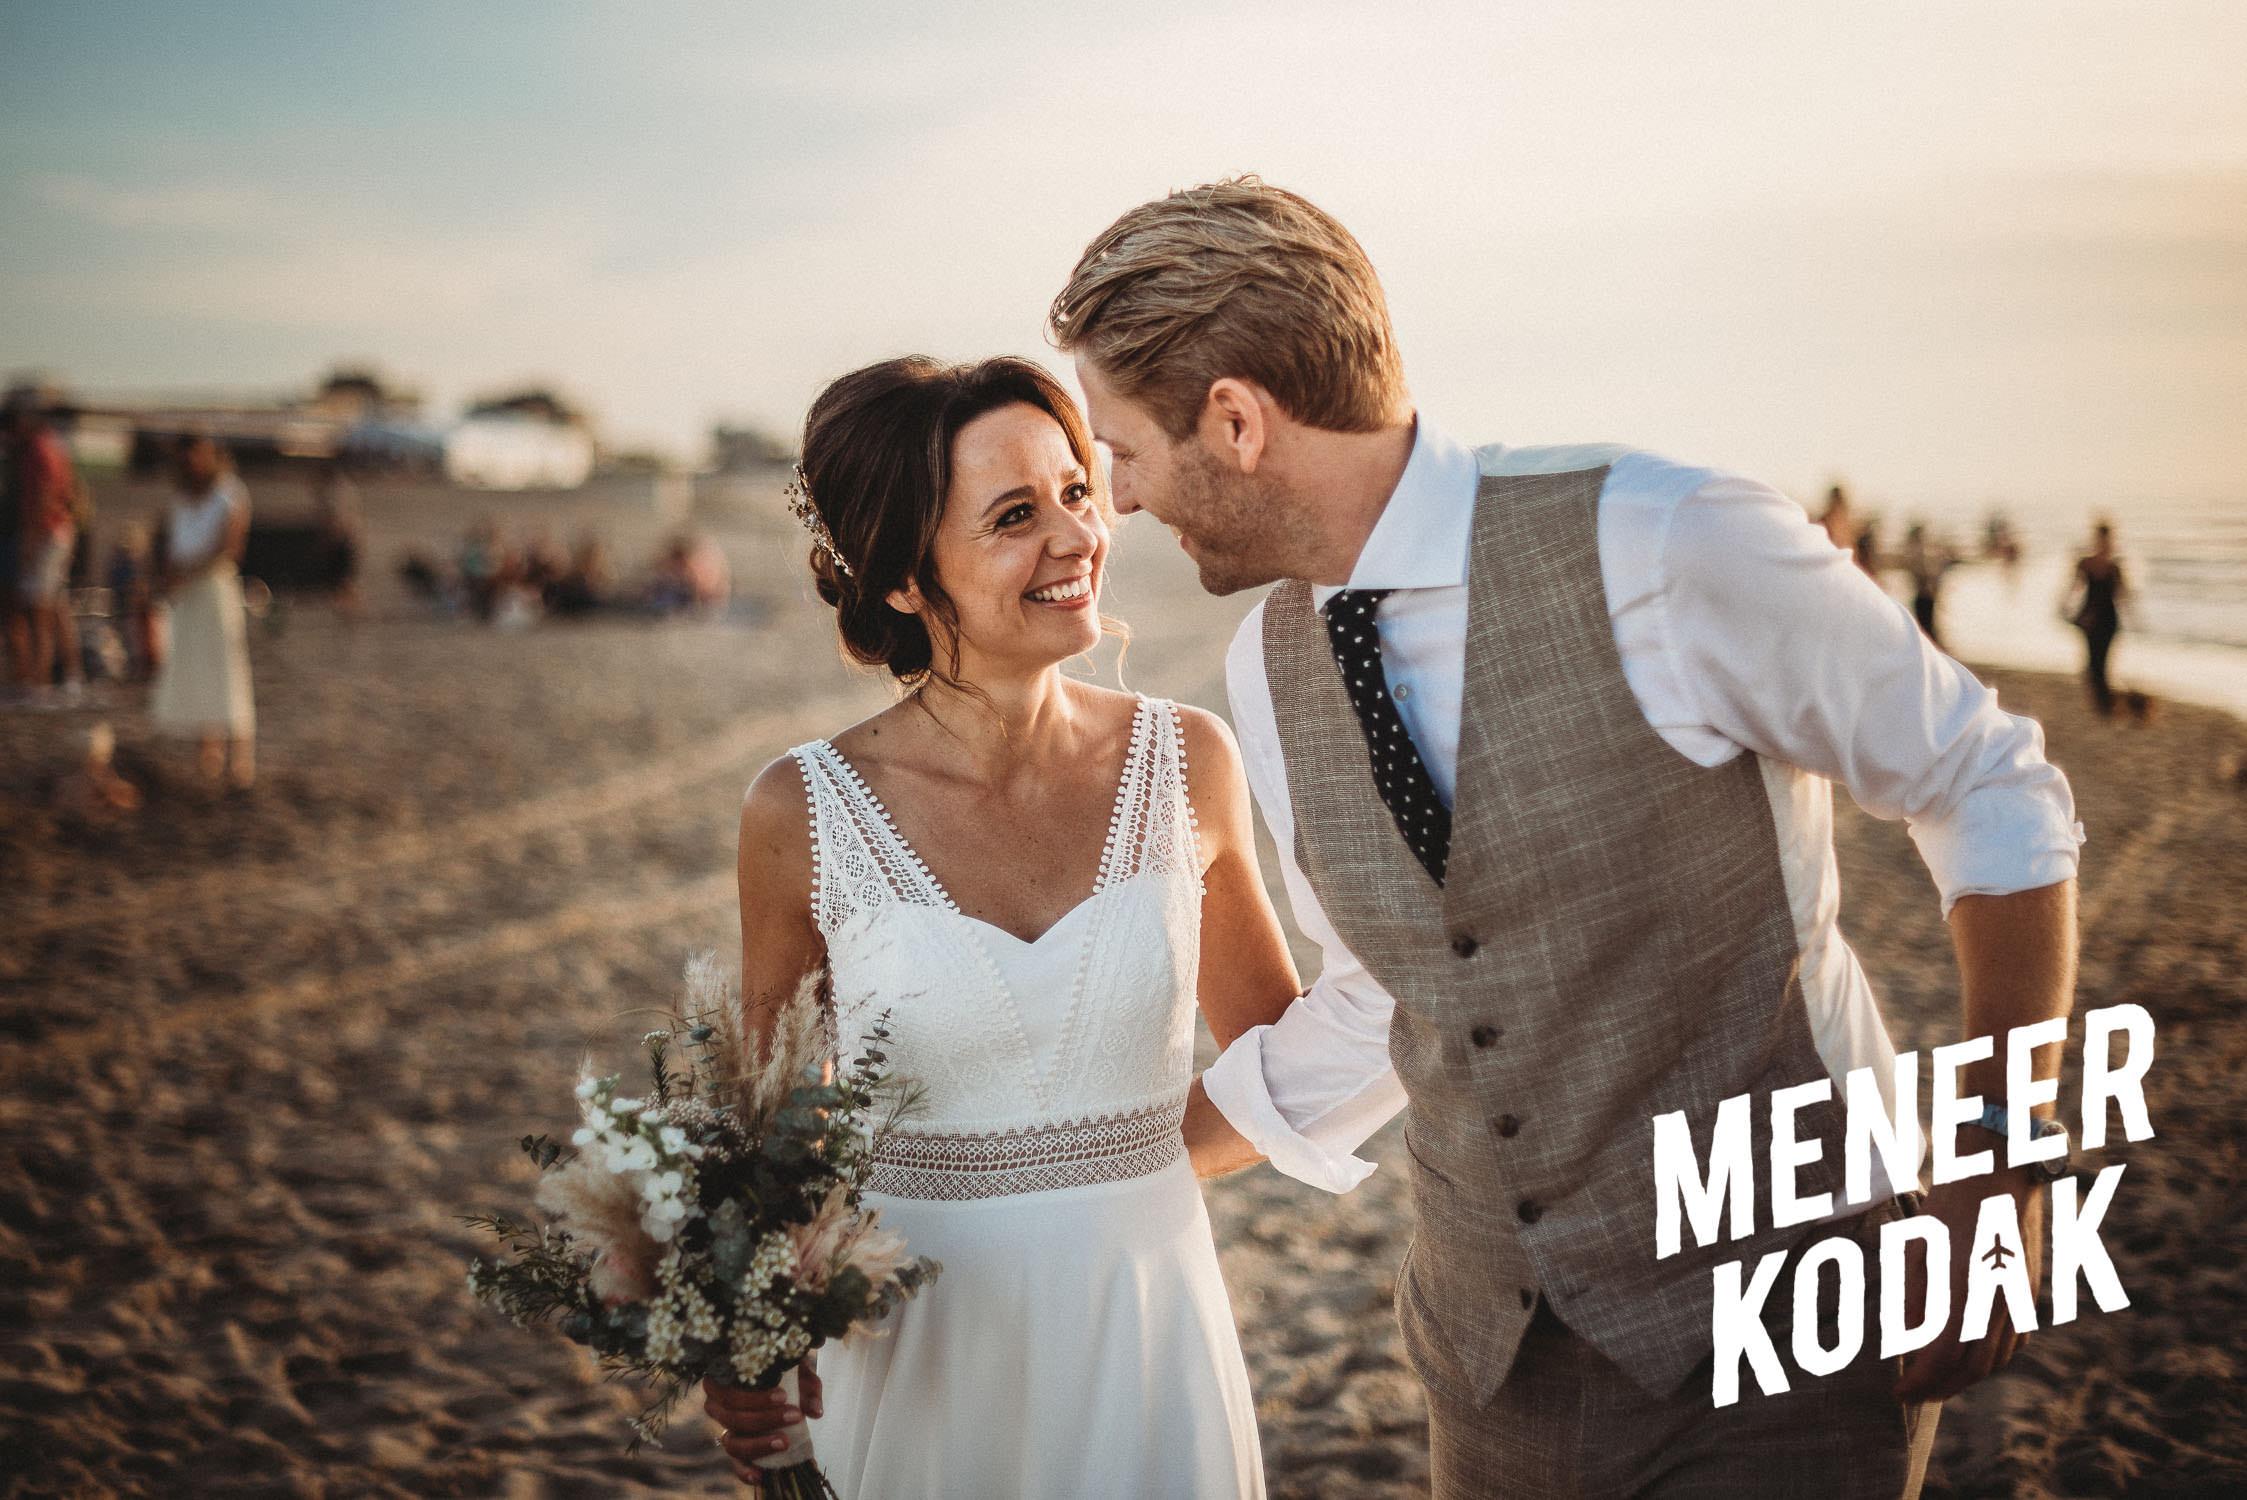 Meneer Kodak - Strandbruiloft - Noordwijk - K&A-113.jpg